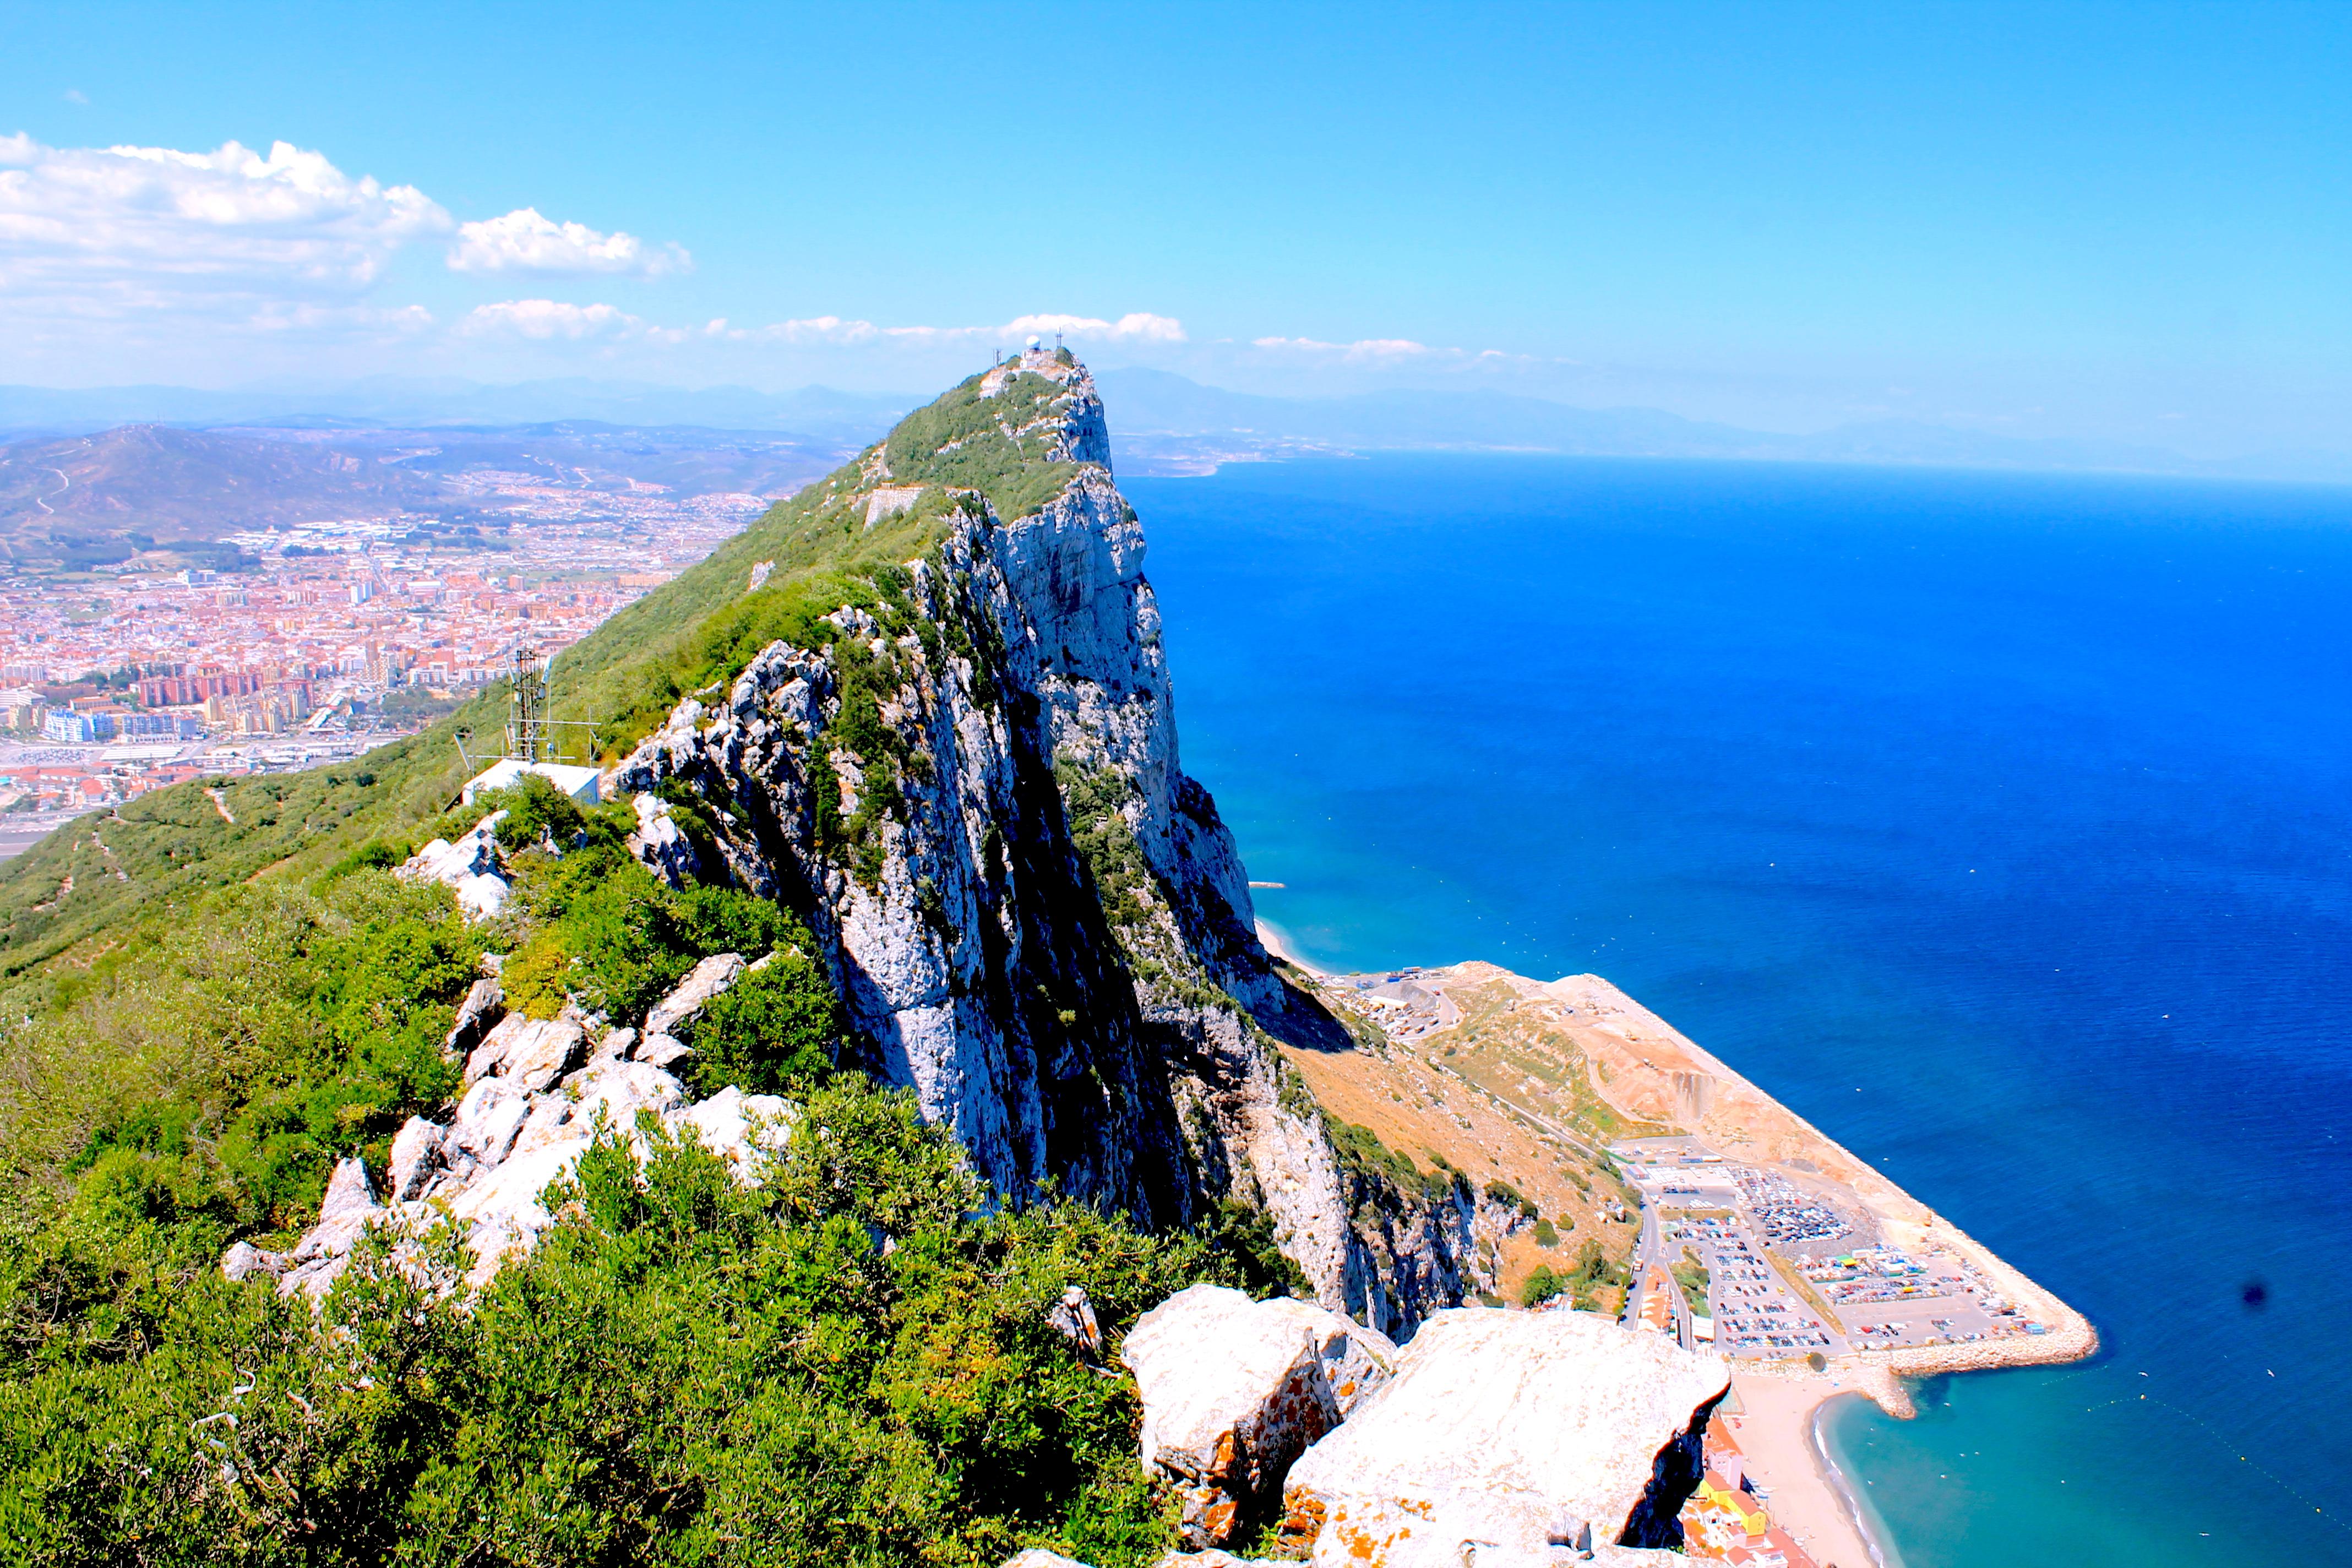 gibraltar-therock-lustforthesublime